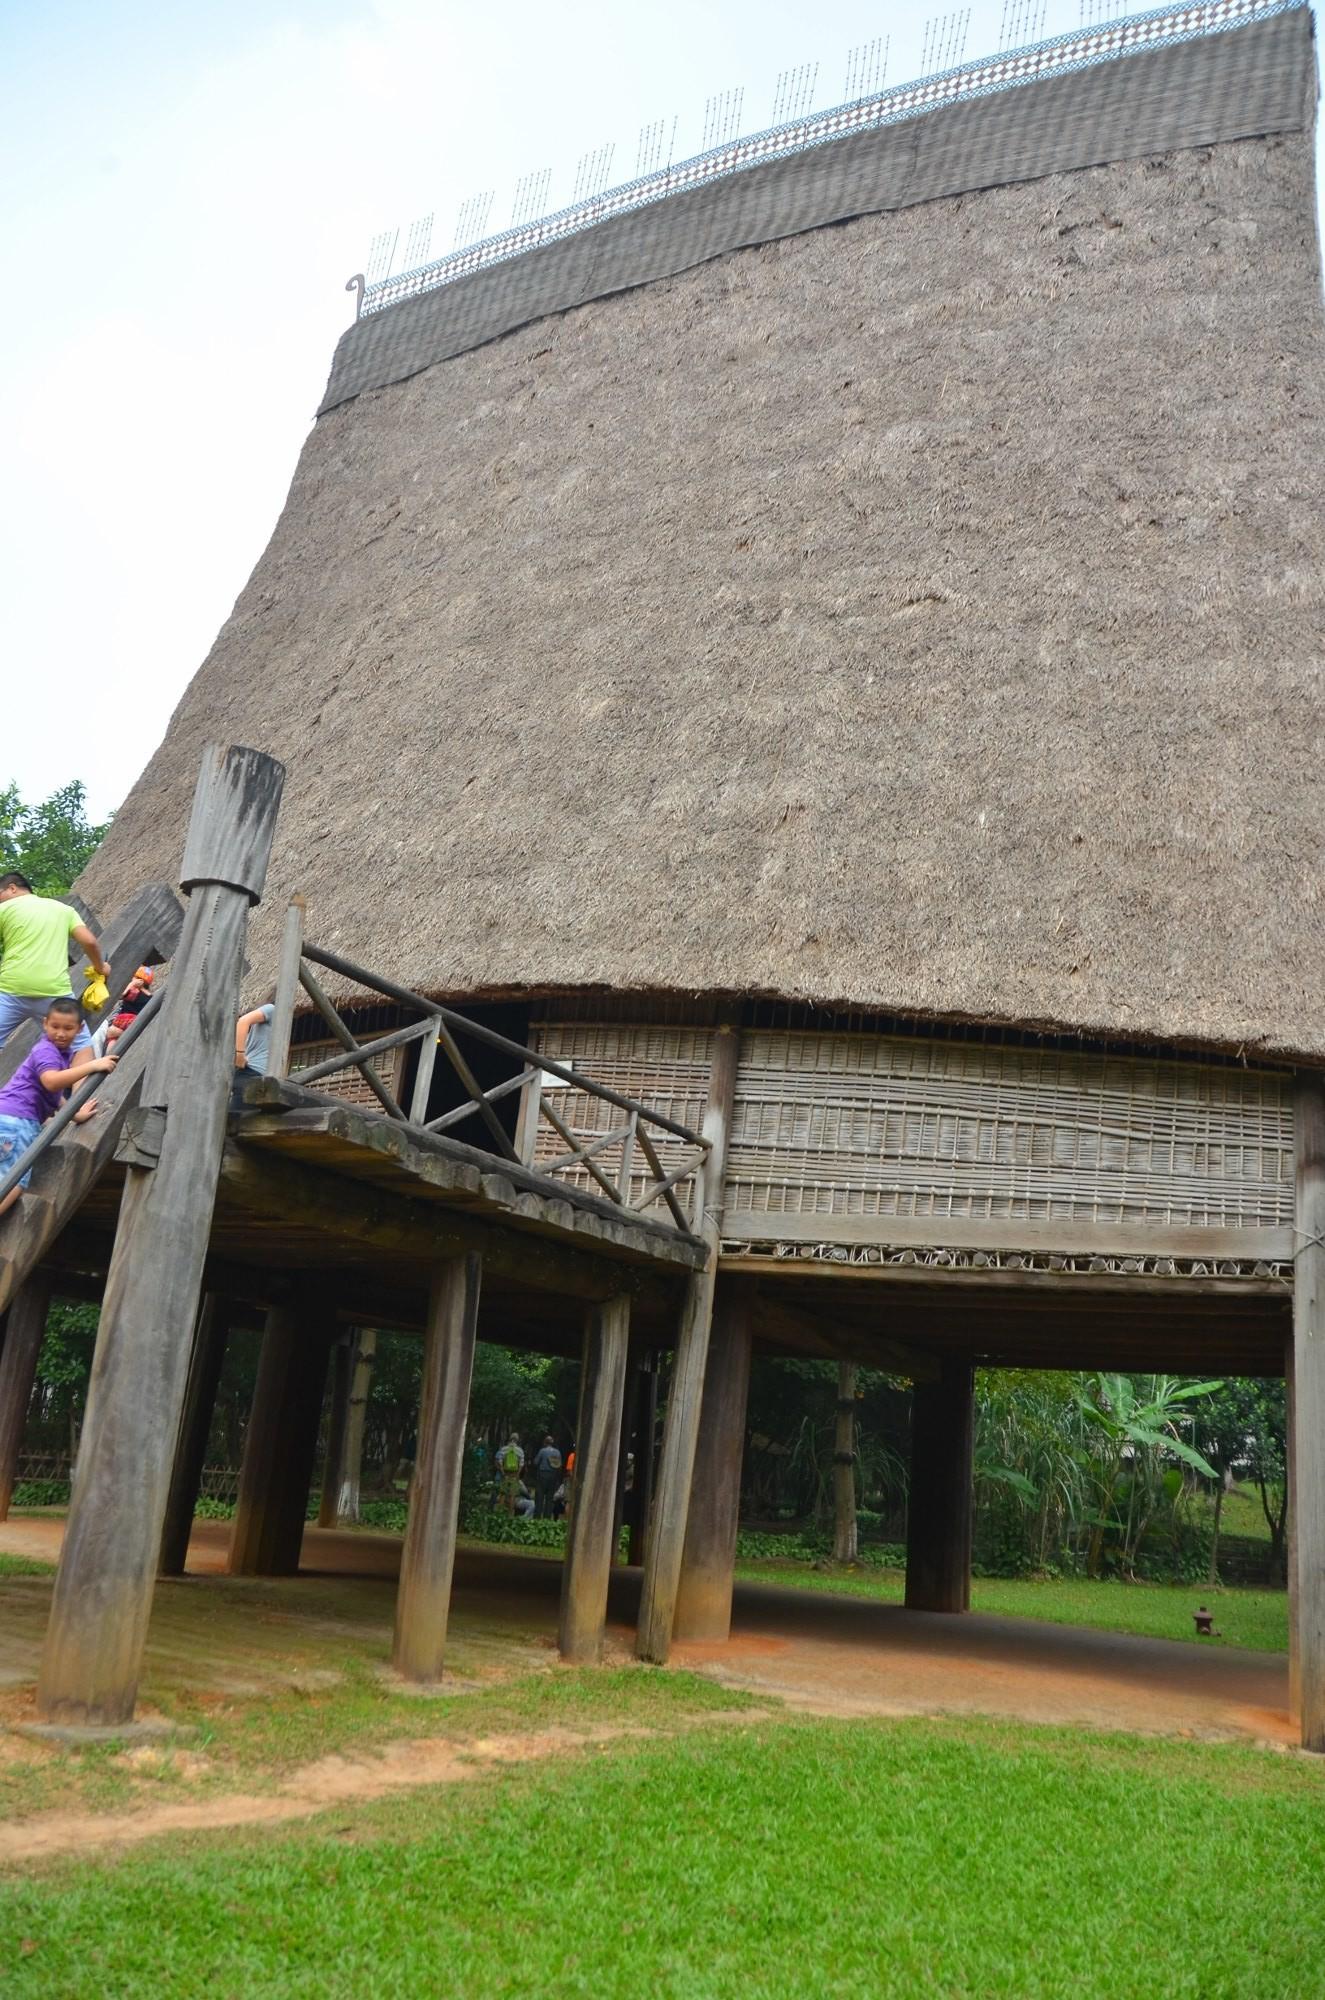 casa palha etnia bahar museu etnografia etnologia hanoi vietnam